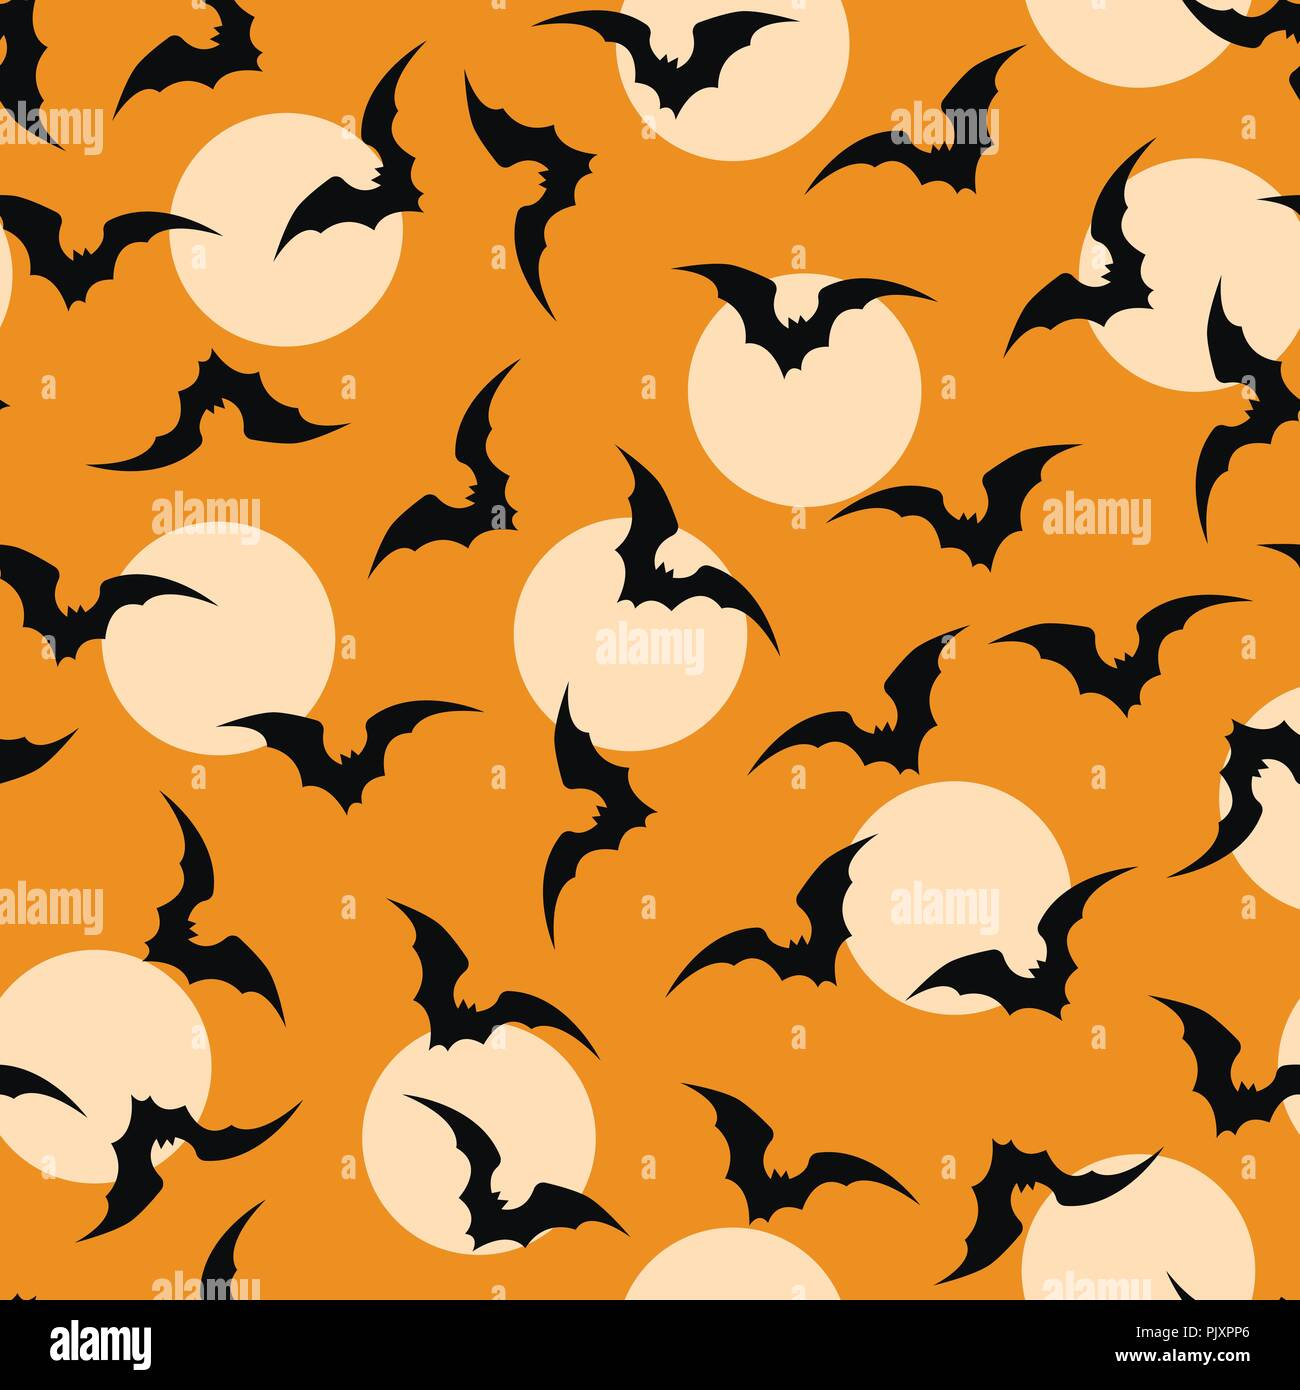 bat ornage halloween background vector - Stock Image